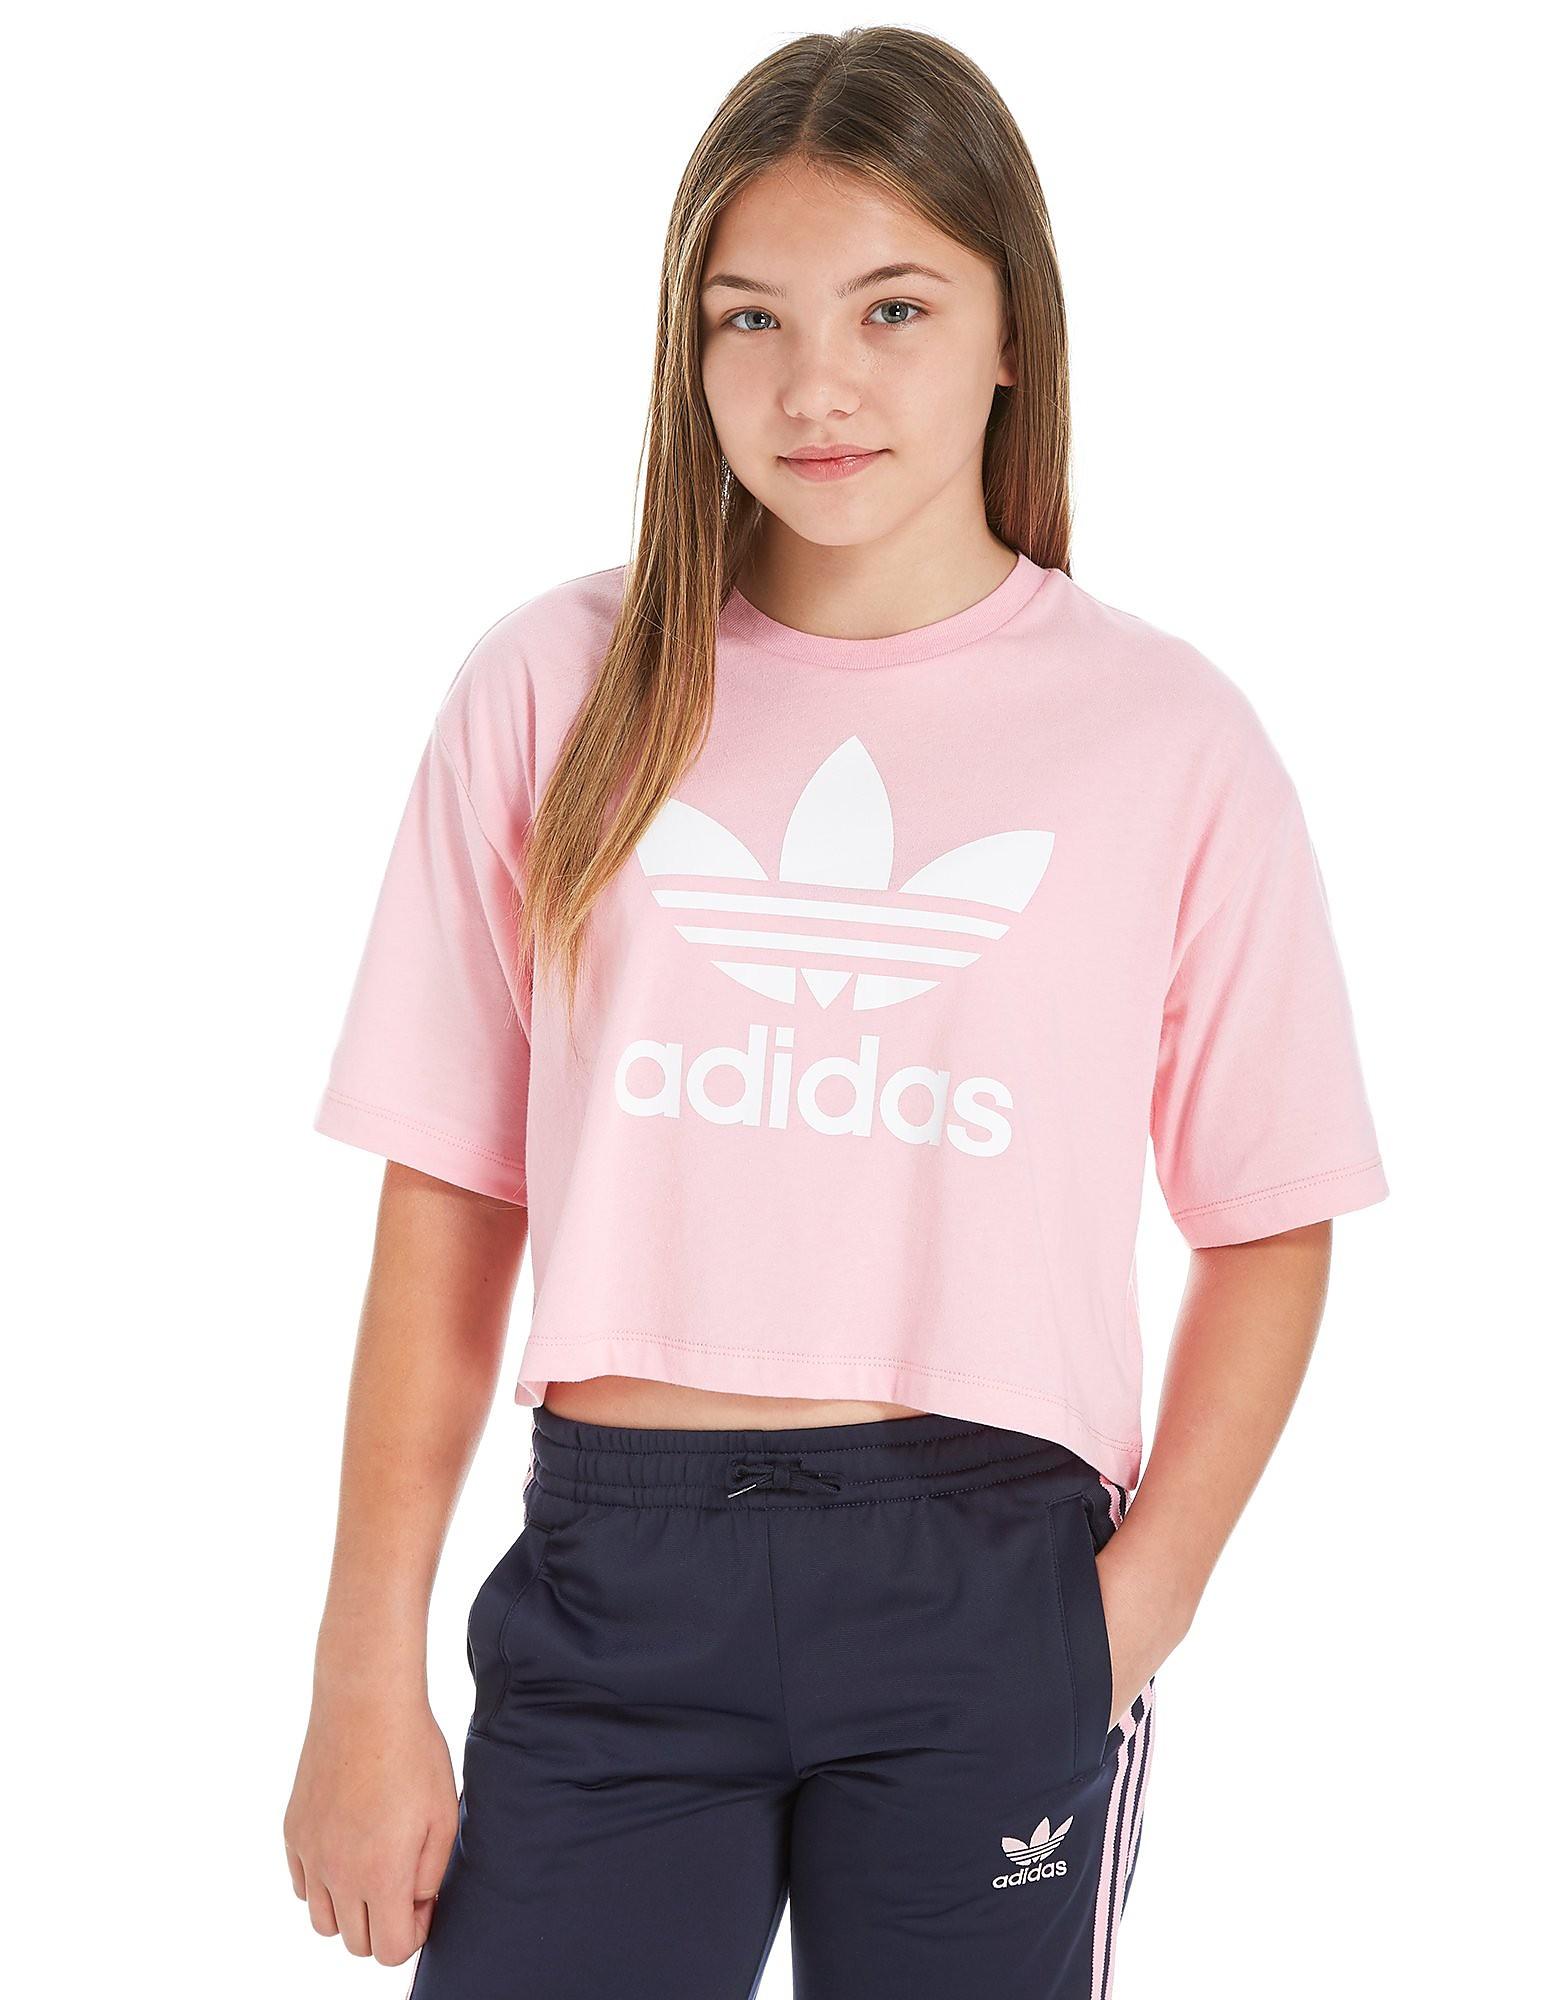 adidas Originals Girl's Trefoil Crop T-Shirt Junior